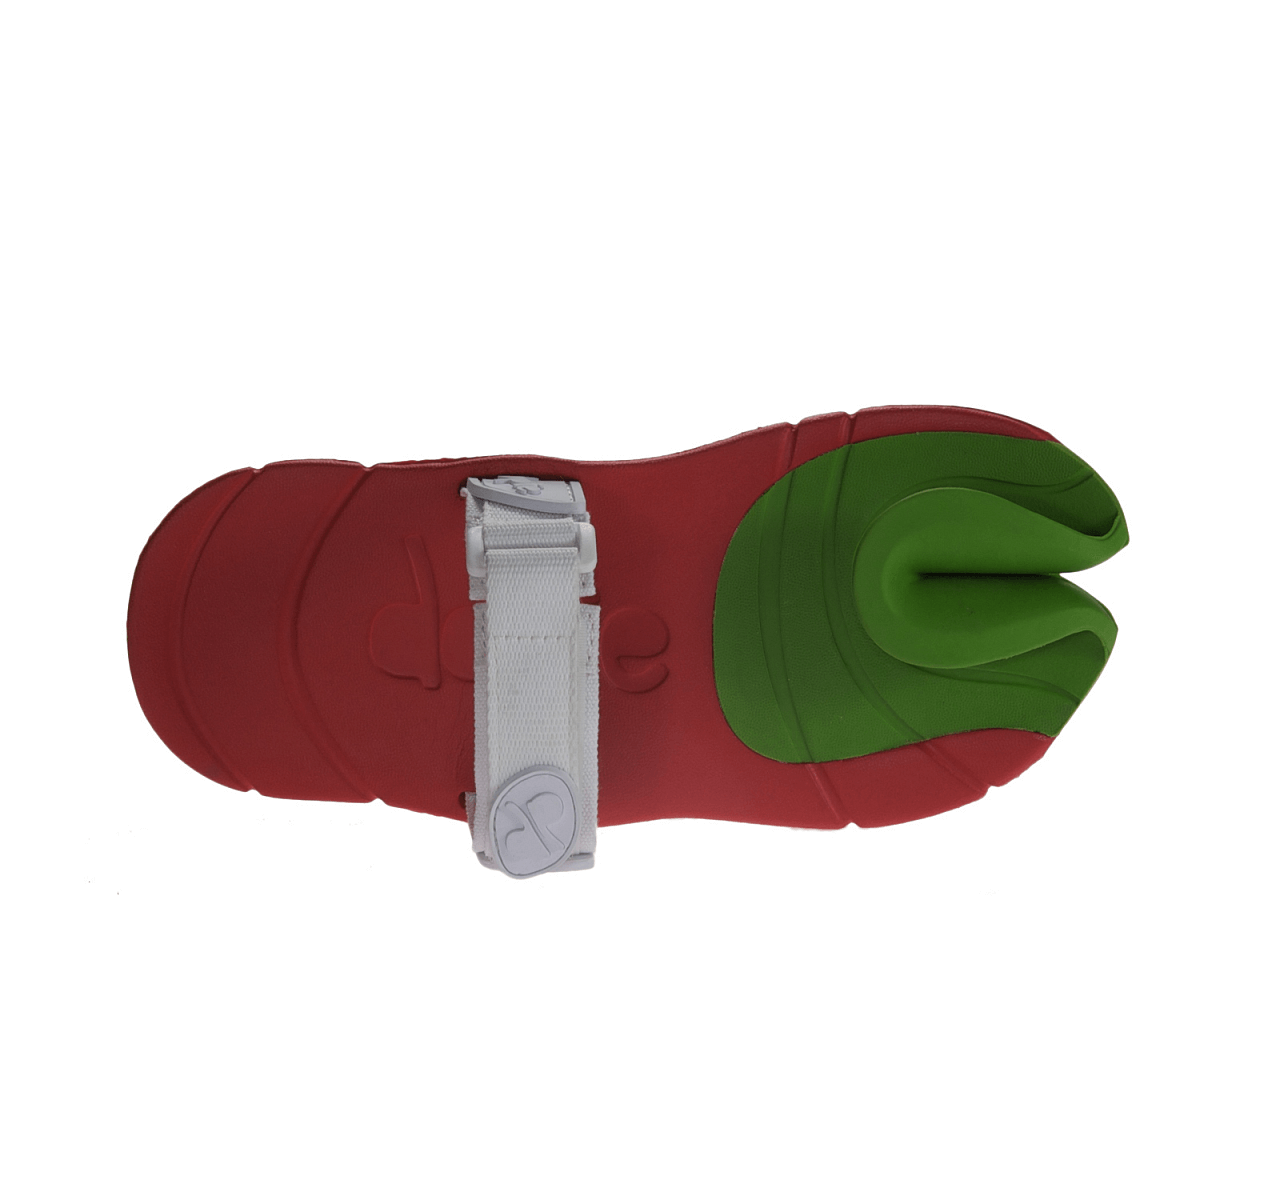 Pánská vycházková obuv VIVOBAREFOOT Dopie Green/ Red